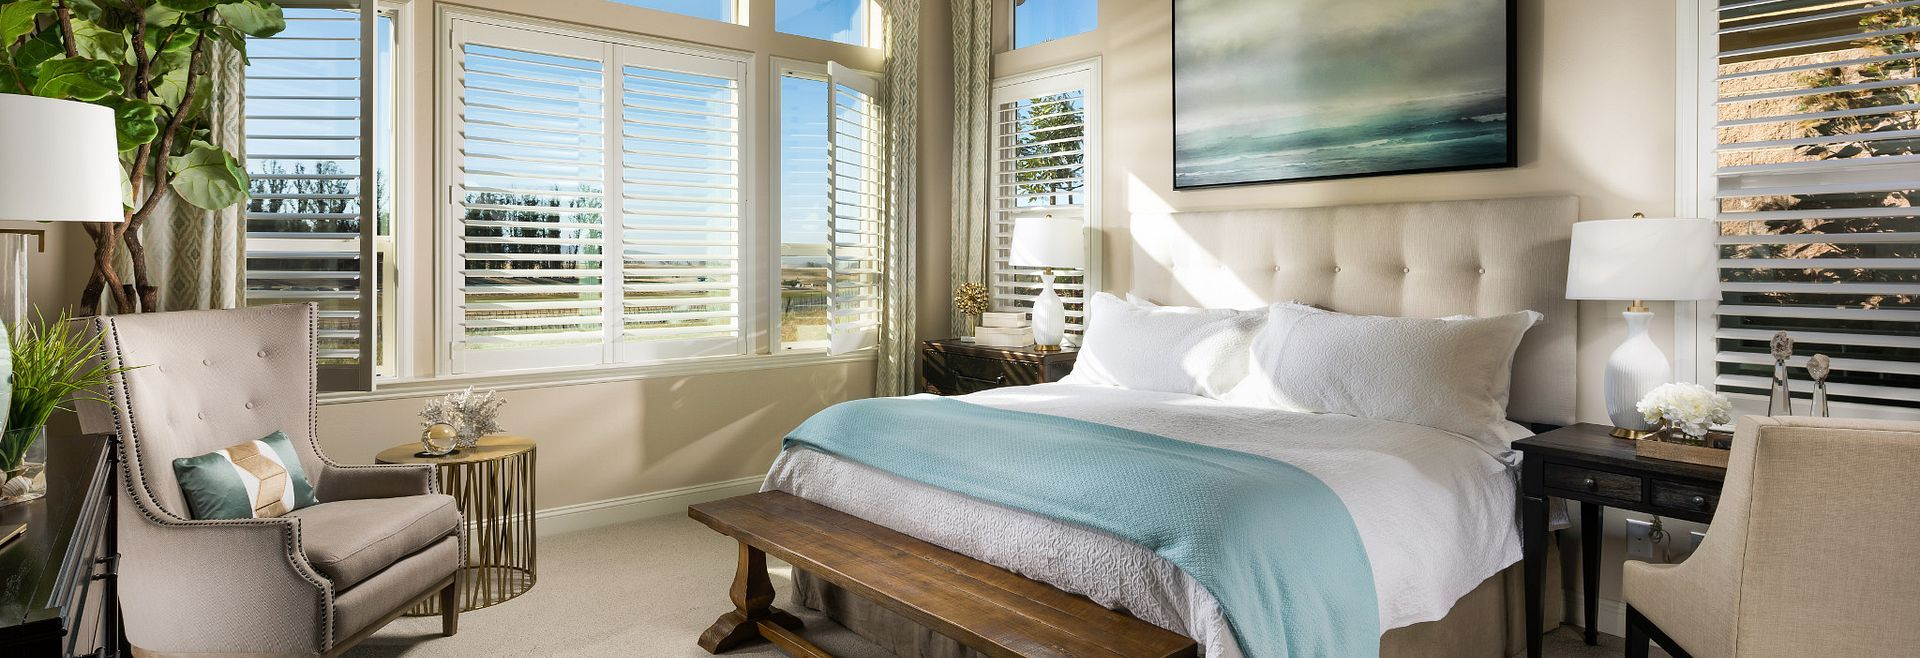 Bedroom featured in the Marsanne By Shea Homes - Trilogy in San Luis Obispo, CA